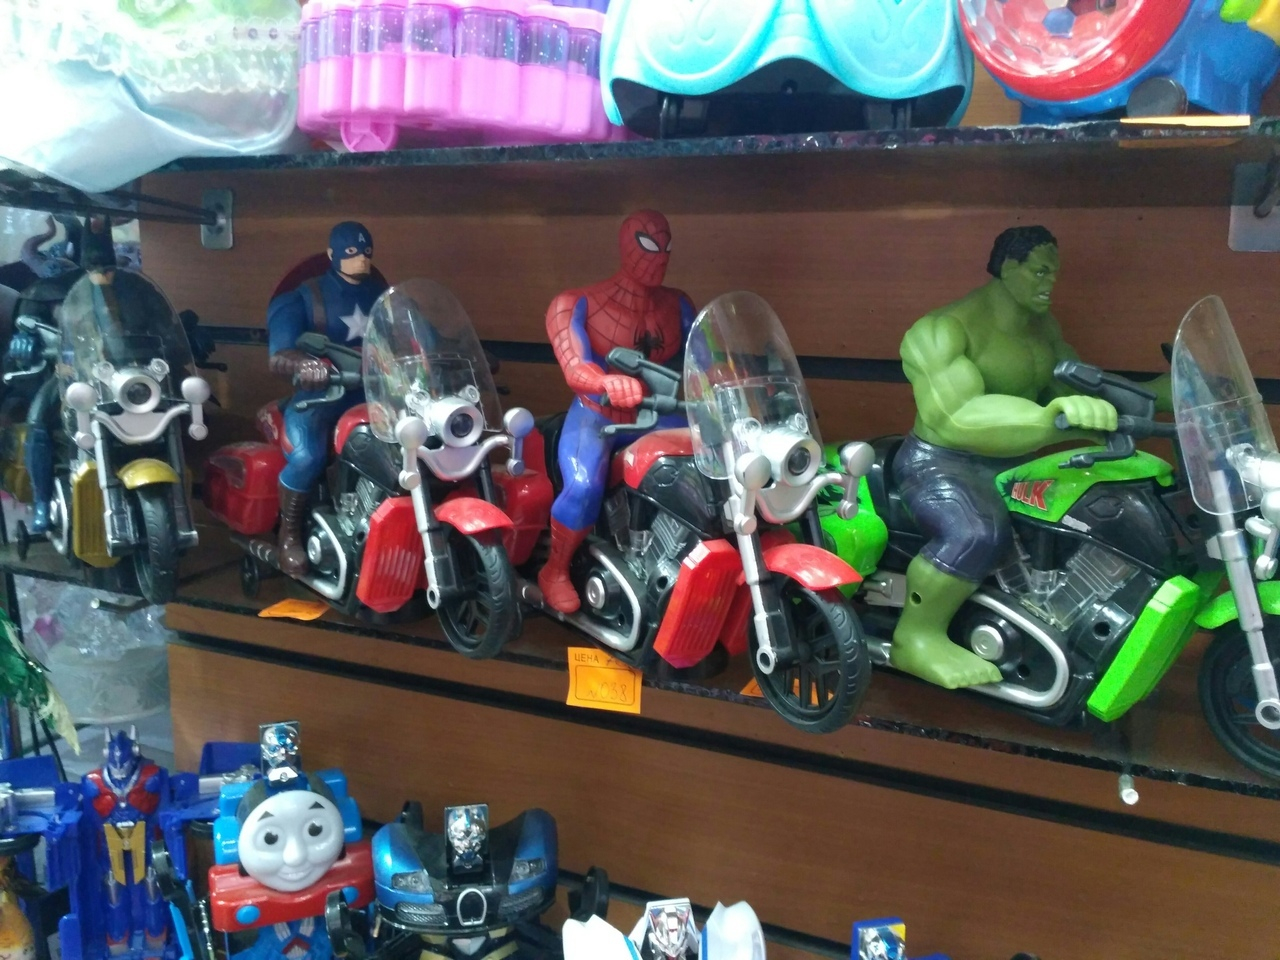 Набор супергероев на мотоциклах: Бэтмен, Капитан Америка, Человек Паук, Халк